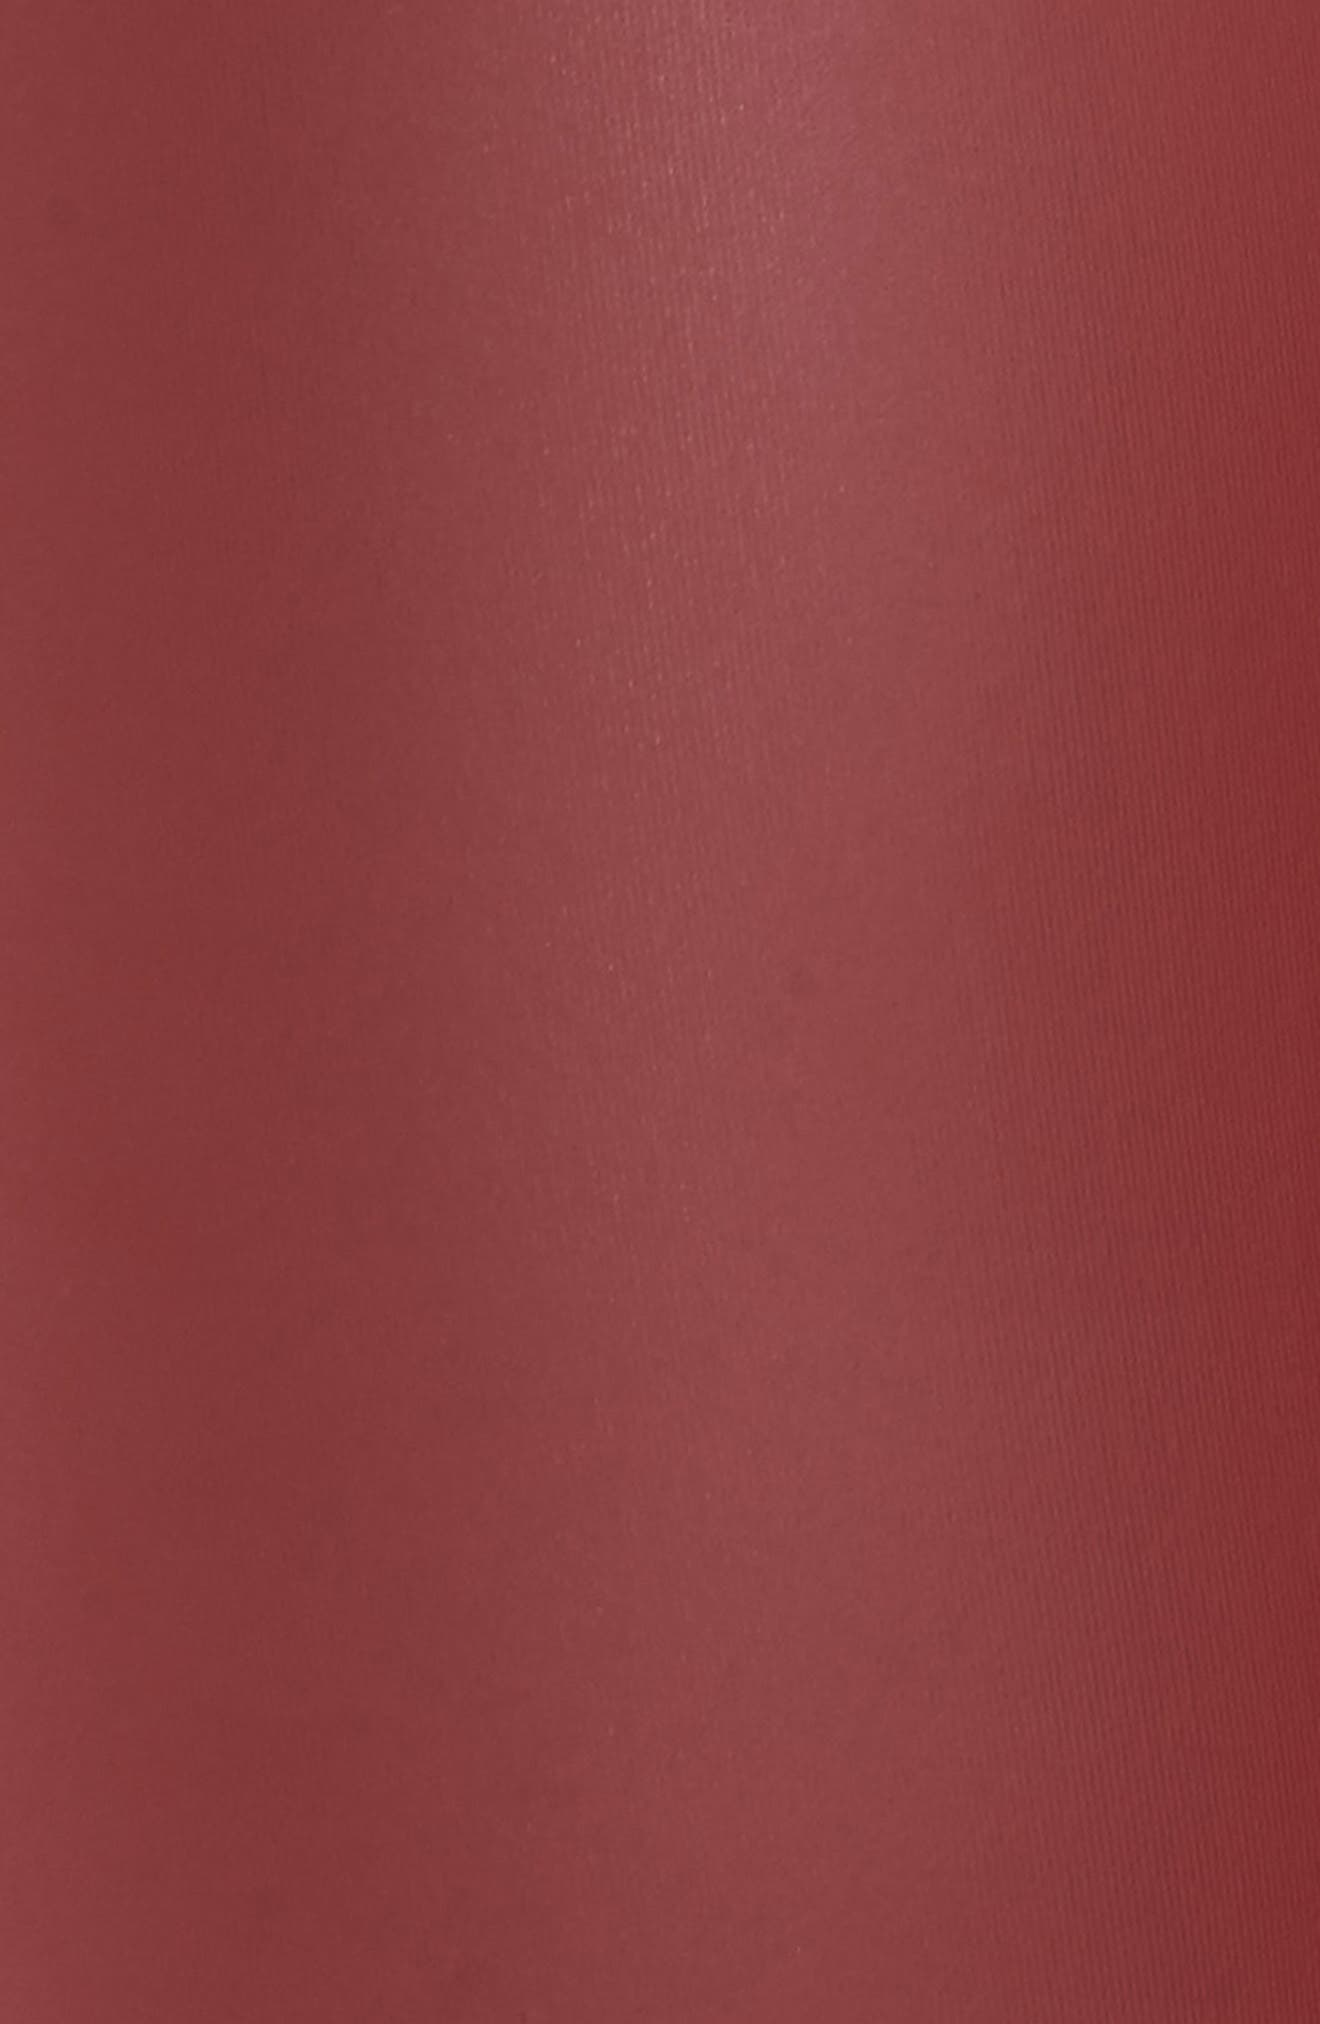 Tony Faux Leather Leggings,                             Alternate thumbnail 6, color,                             Cabernet